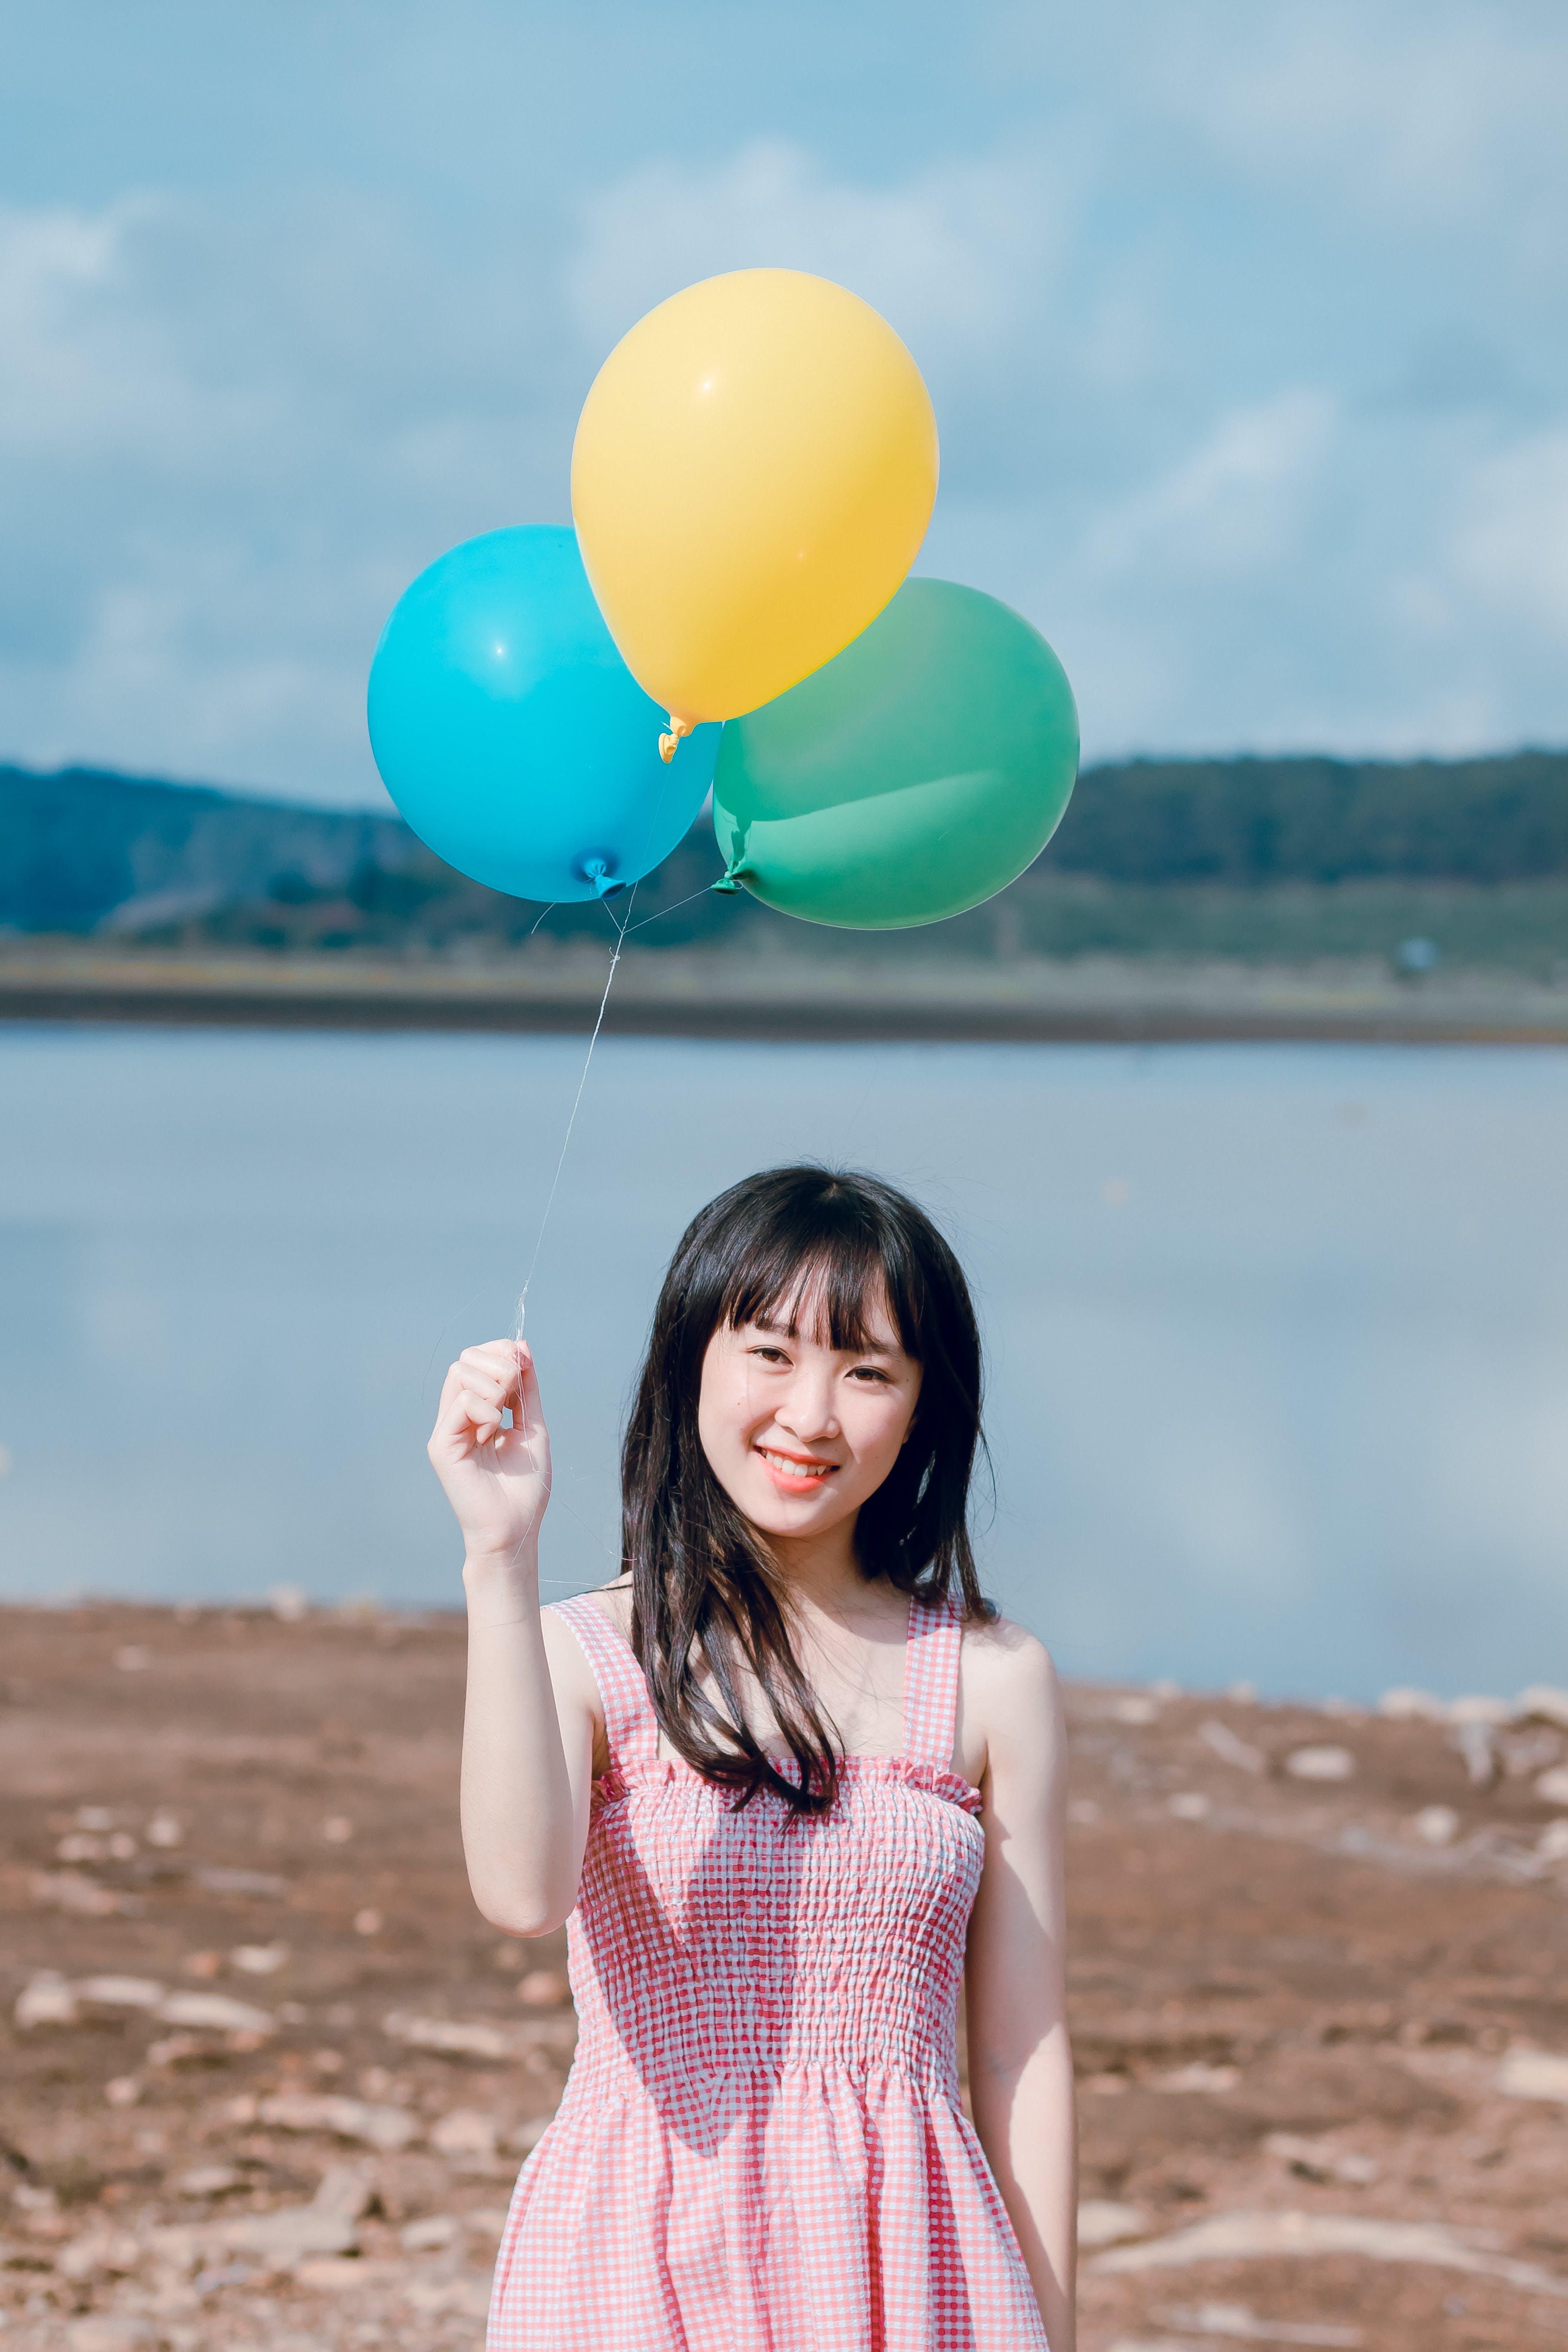 Foto stok gratis bagus, balon, cewek, gadis asia